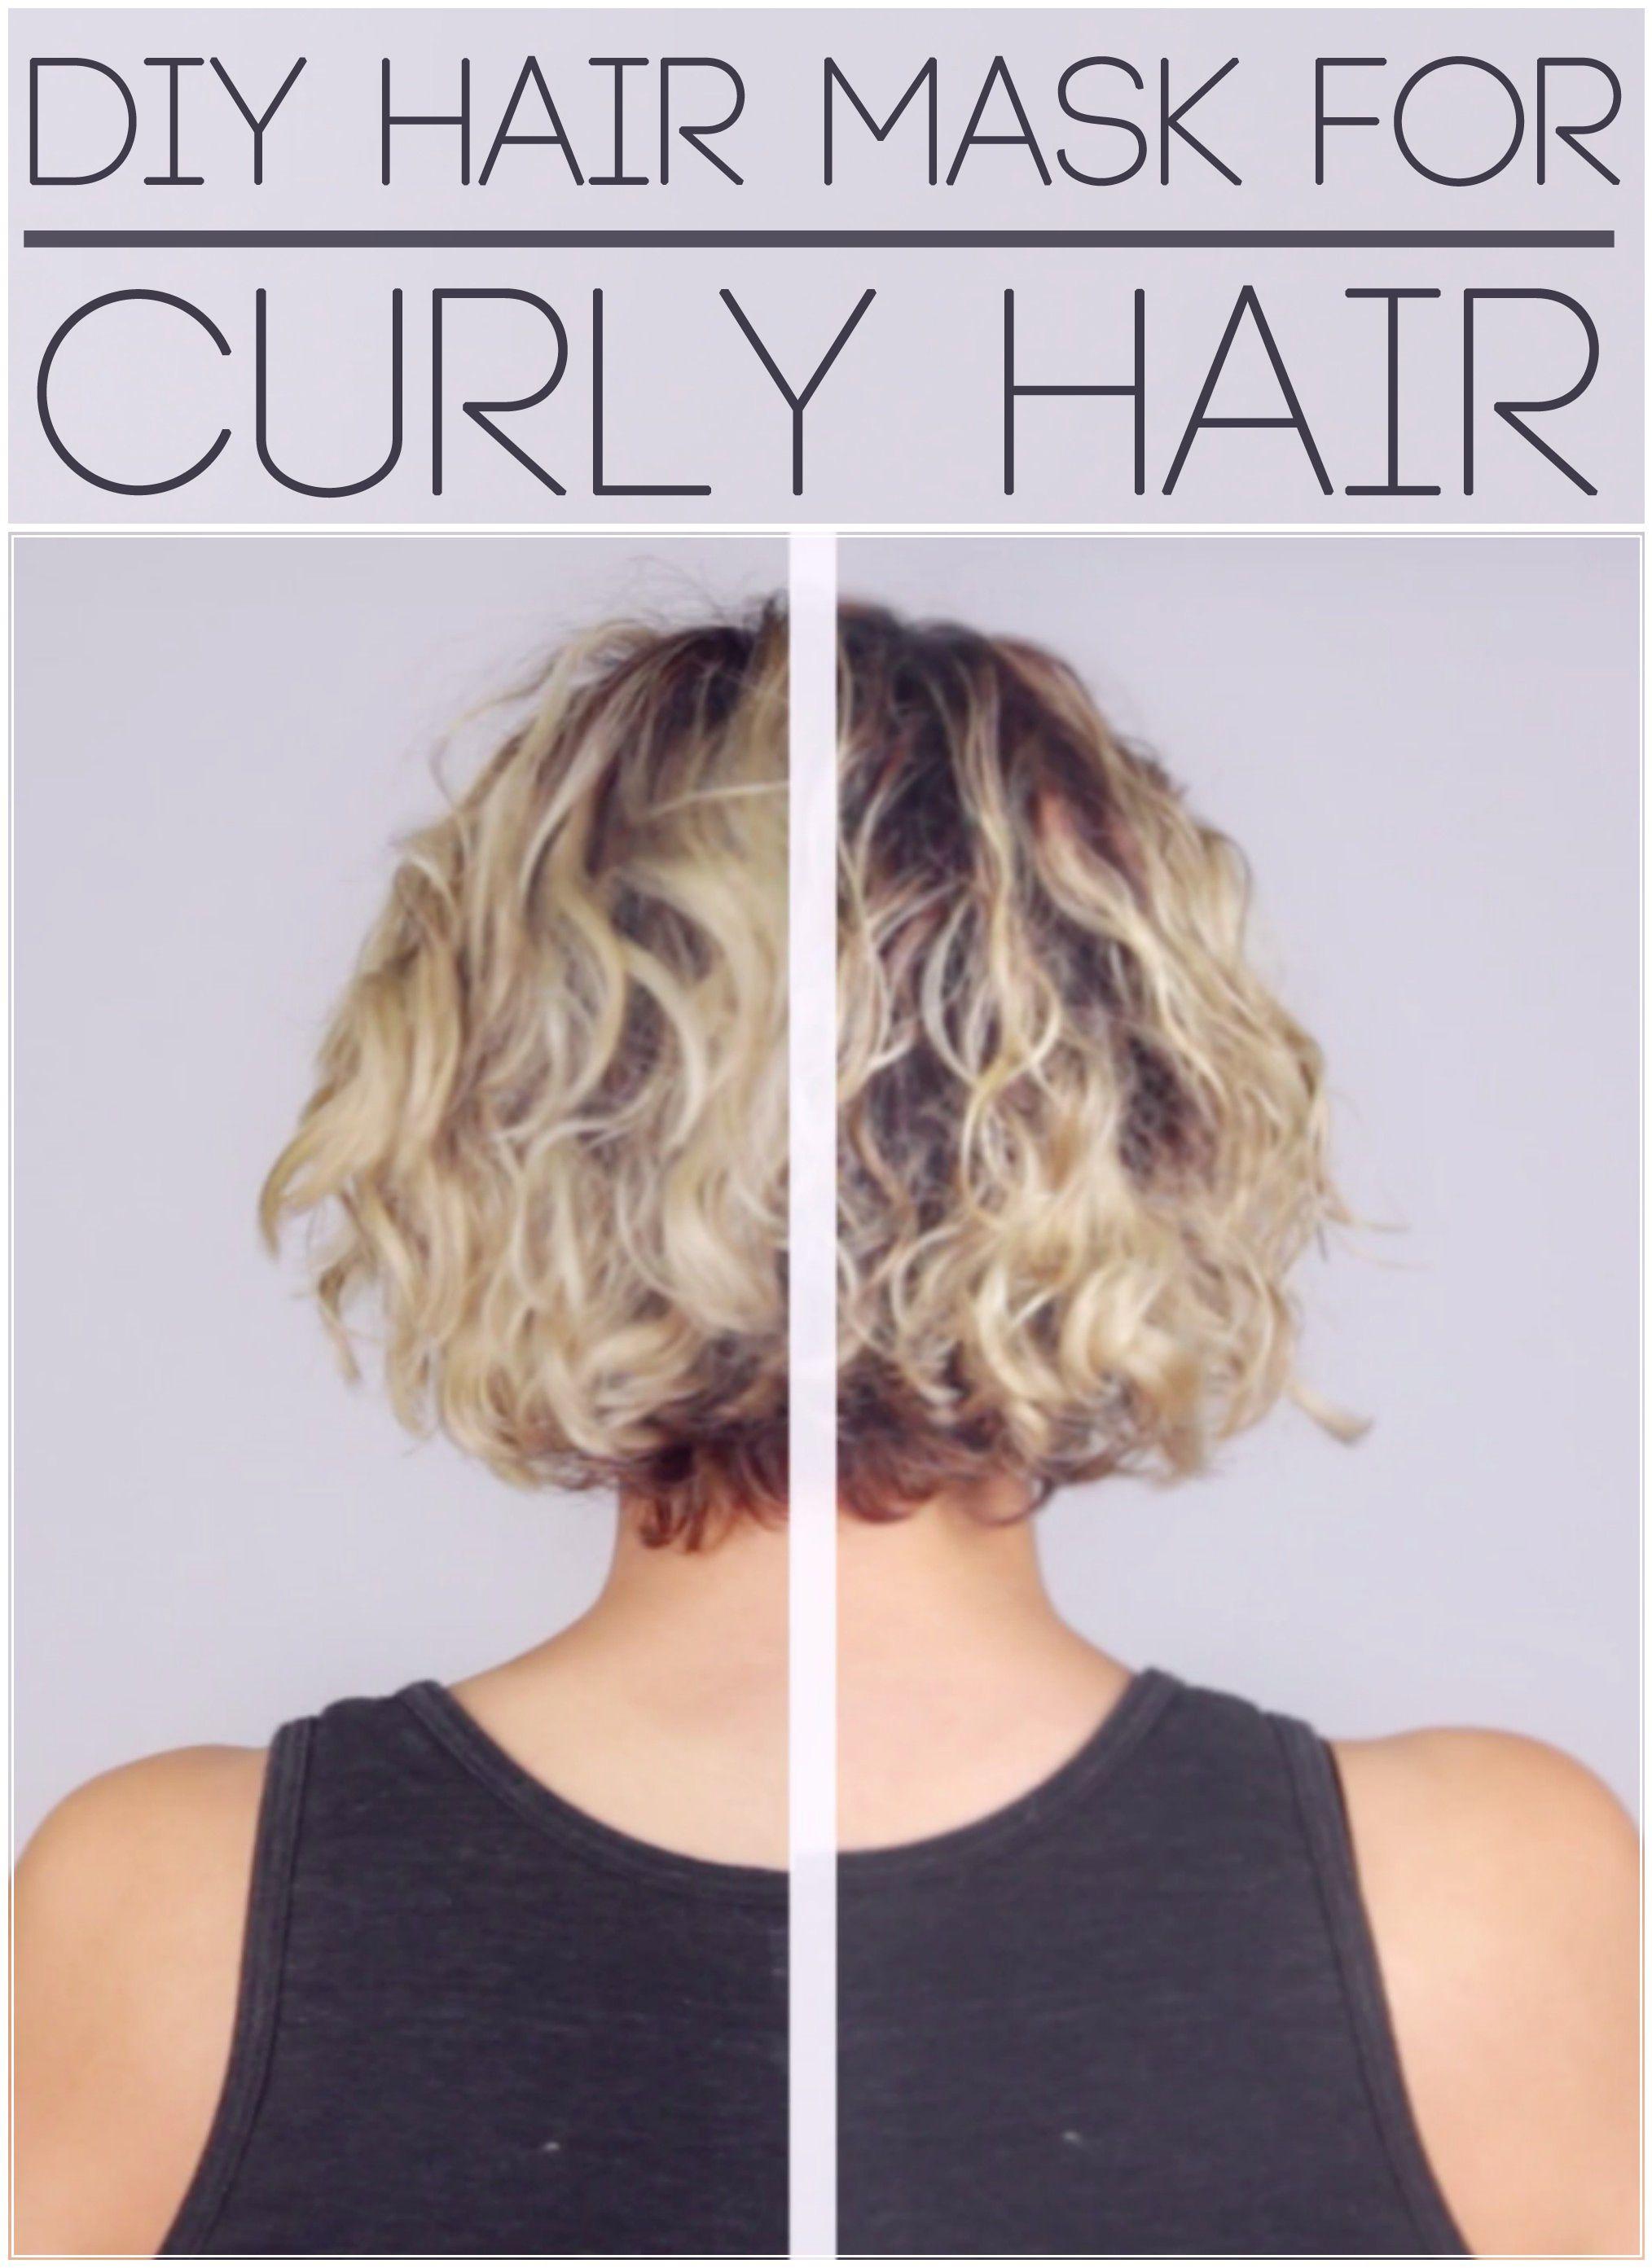 Diy Hair Mask For Curly Hair 1 Egg 2 Tbsp Mayo 1 Tbsp Olive Oil 1tbsp Honey Curly Hair Styles Curly Hair Diy Diy Hairstyles